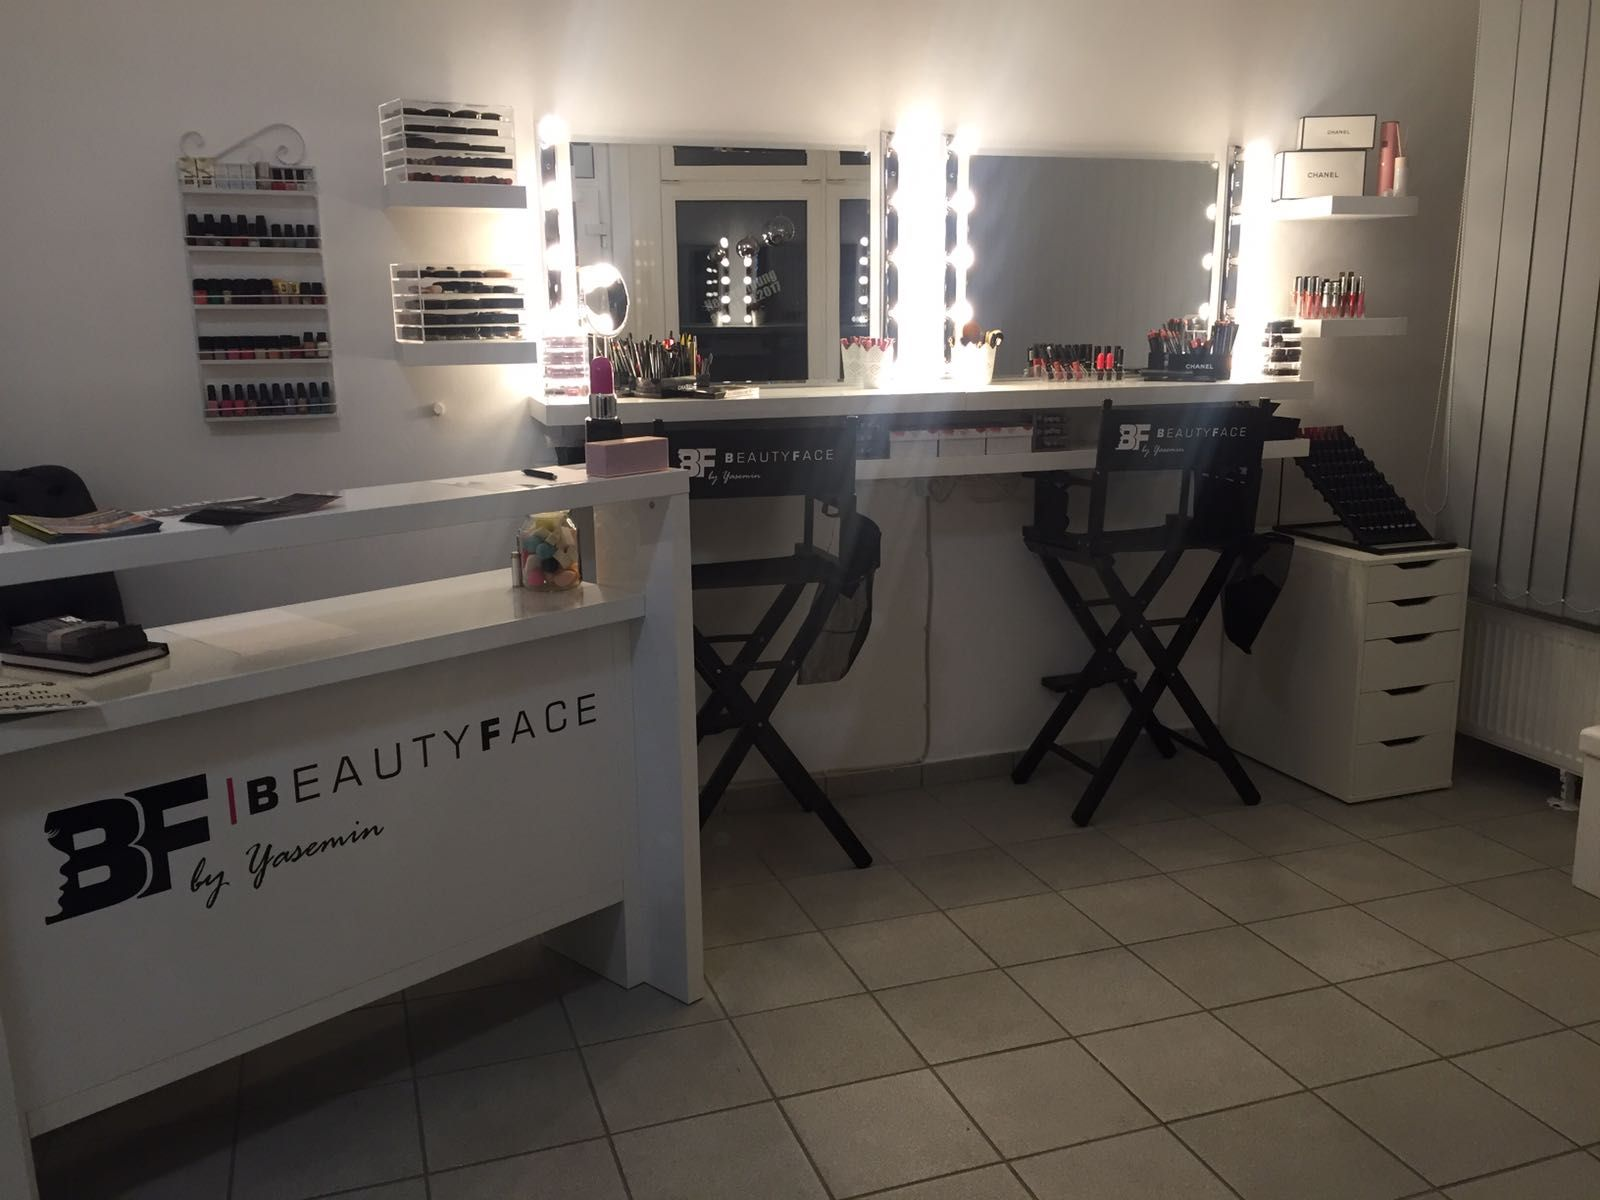 Yasemin Beauty Beautyface By Yasemin In Bottrop Microblading Permanent Makeup Make Up Gesichtskosmetik U Dauerhafte Haarentfernung Microblading Make Up